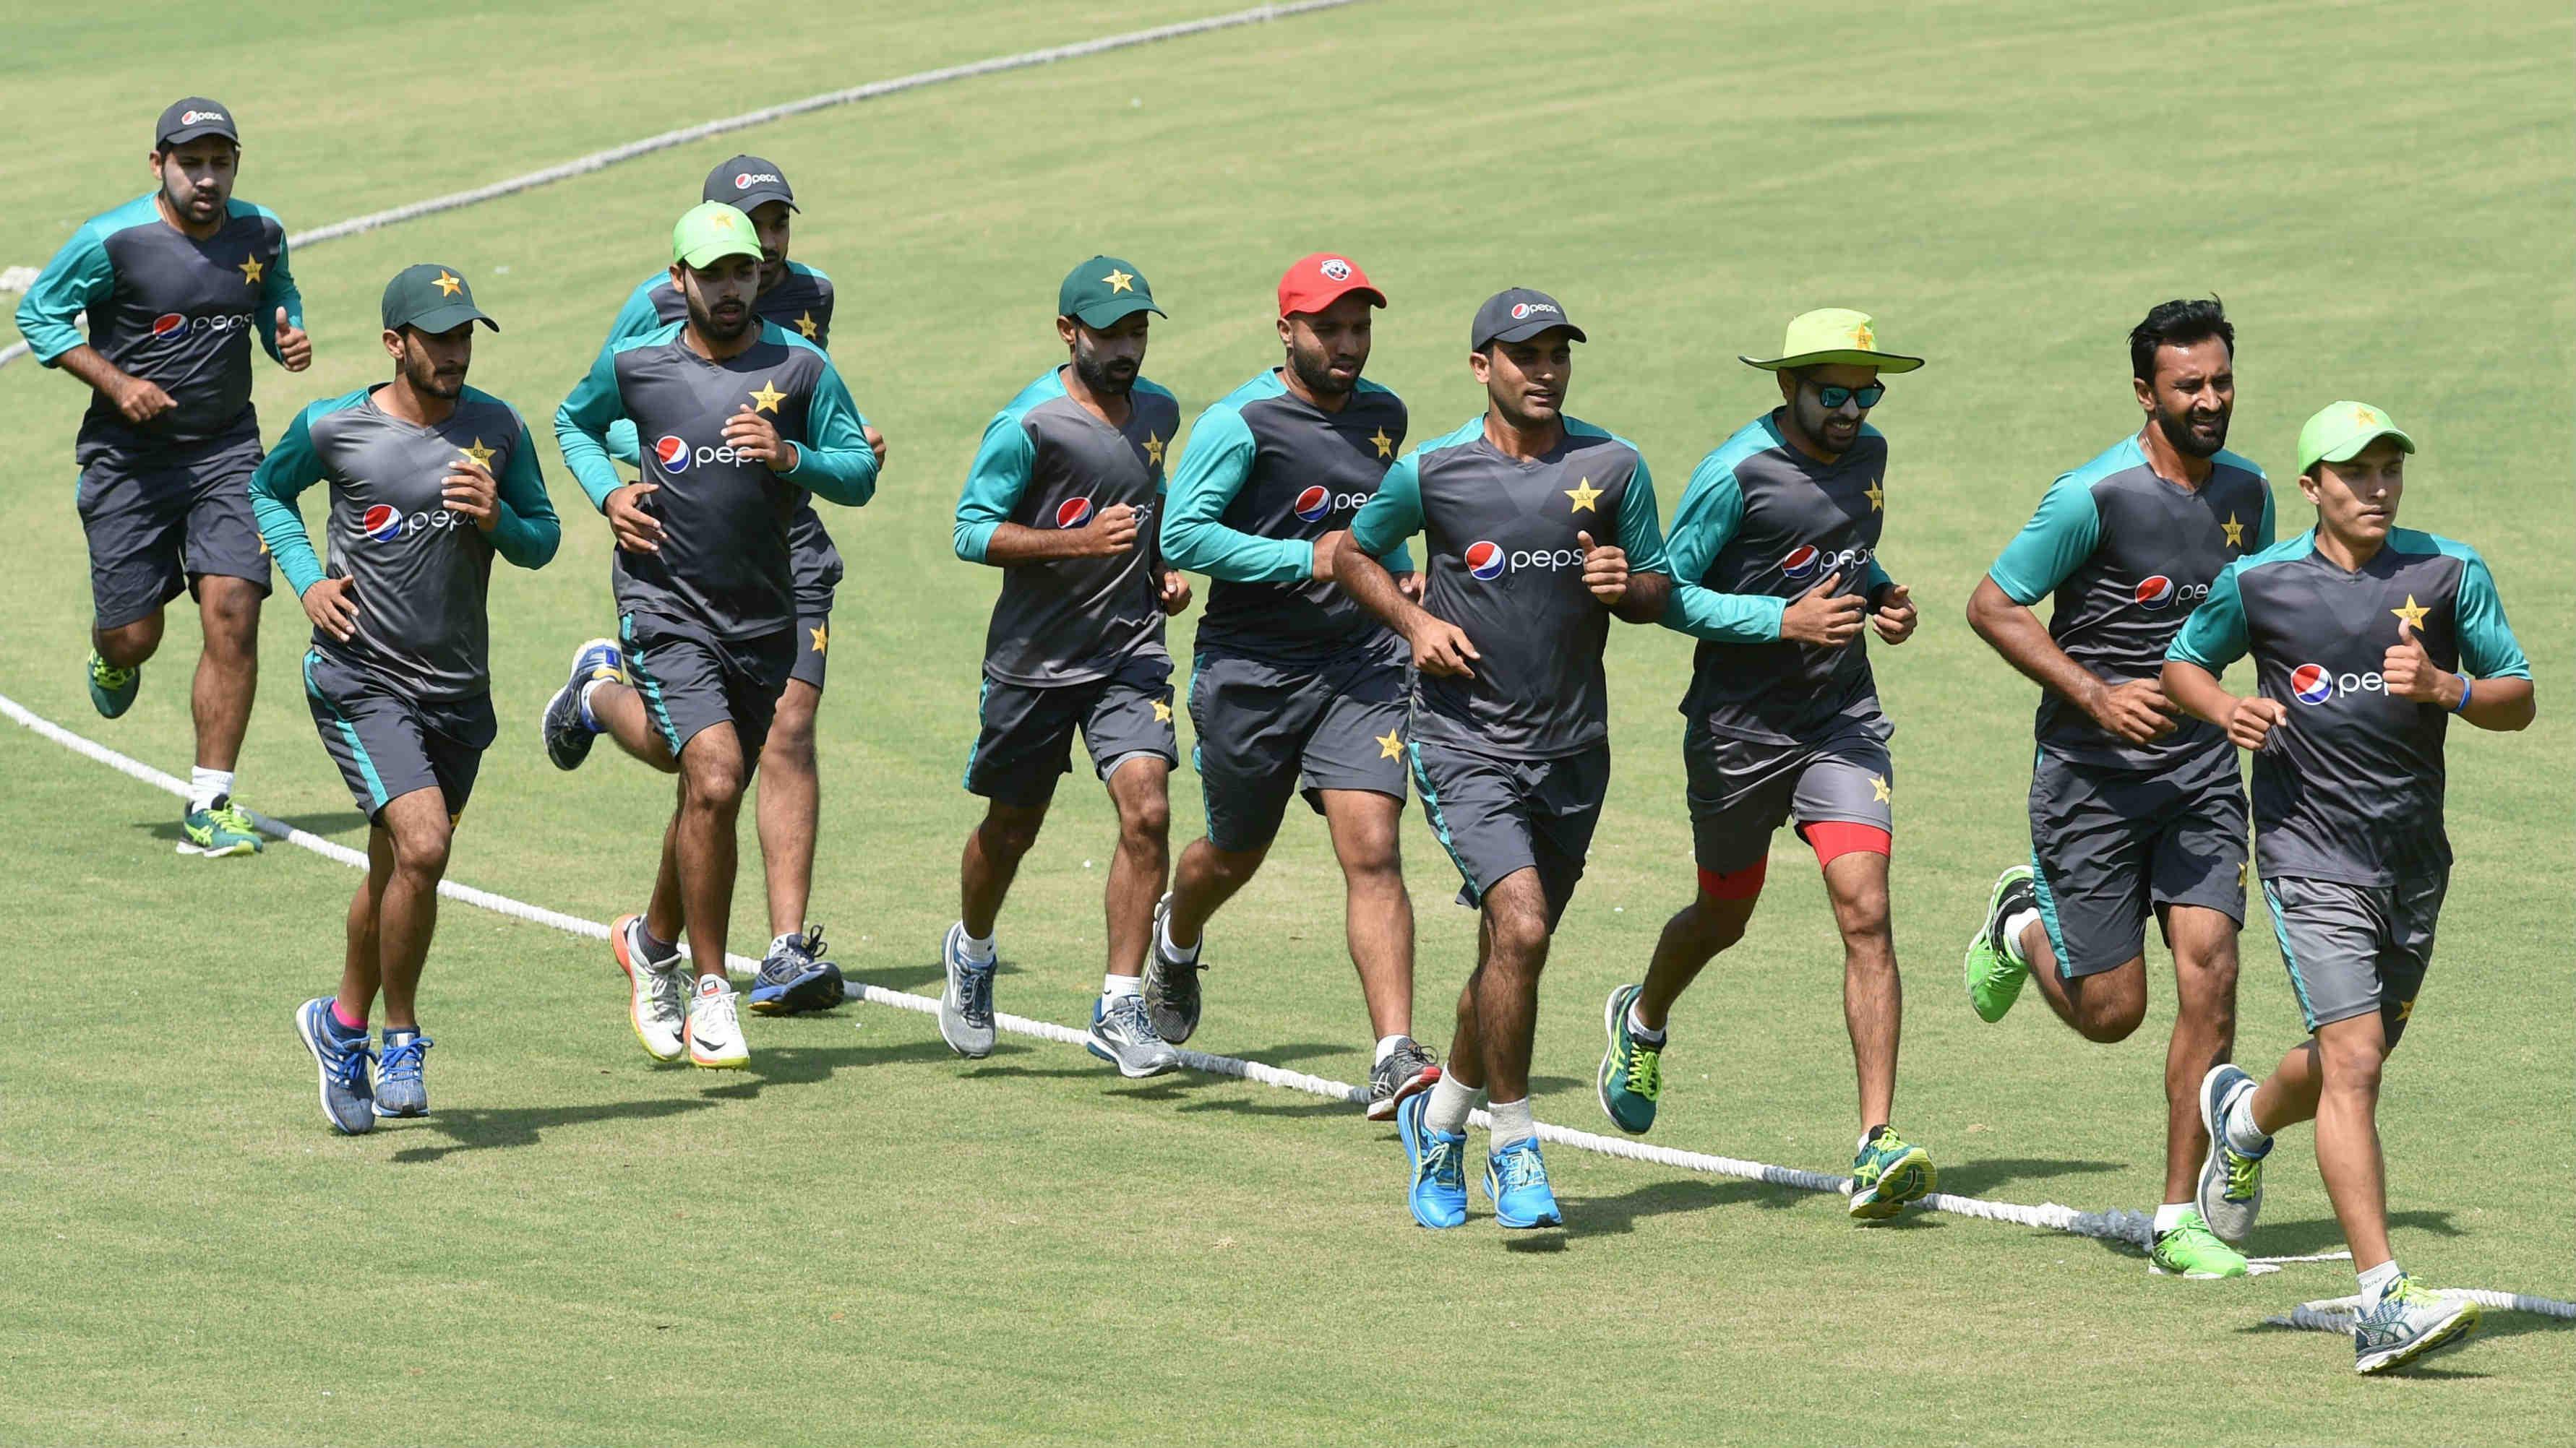 England 2016 to England 2018 – Pakistan's rocky journey